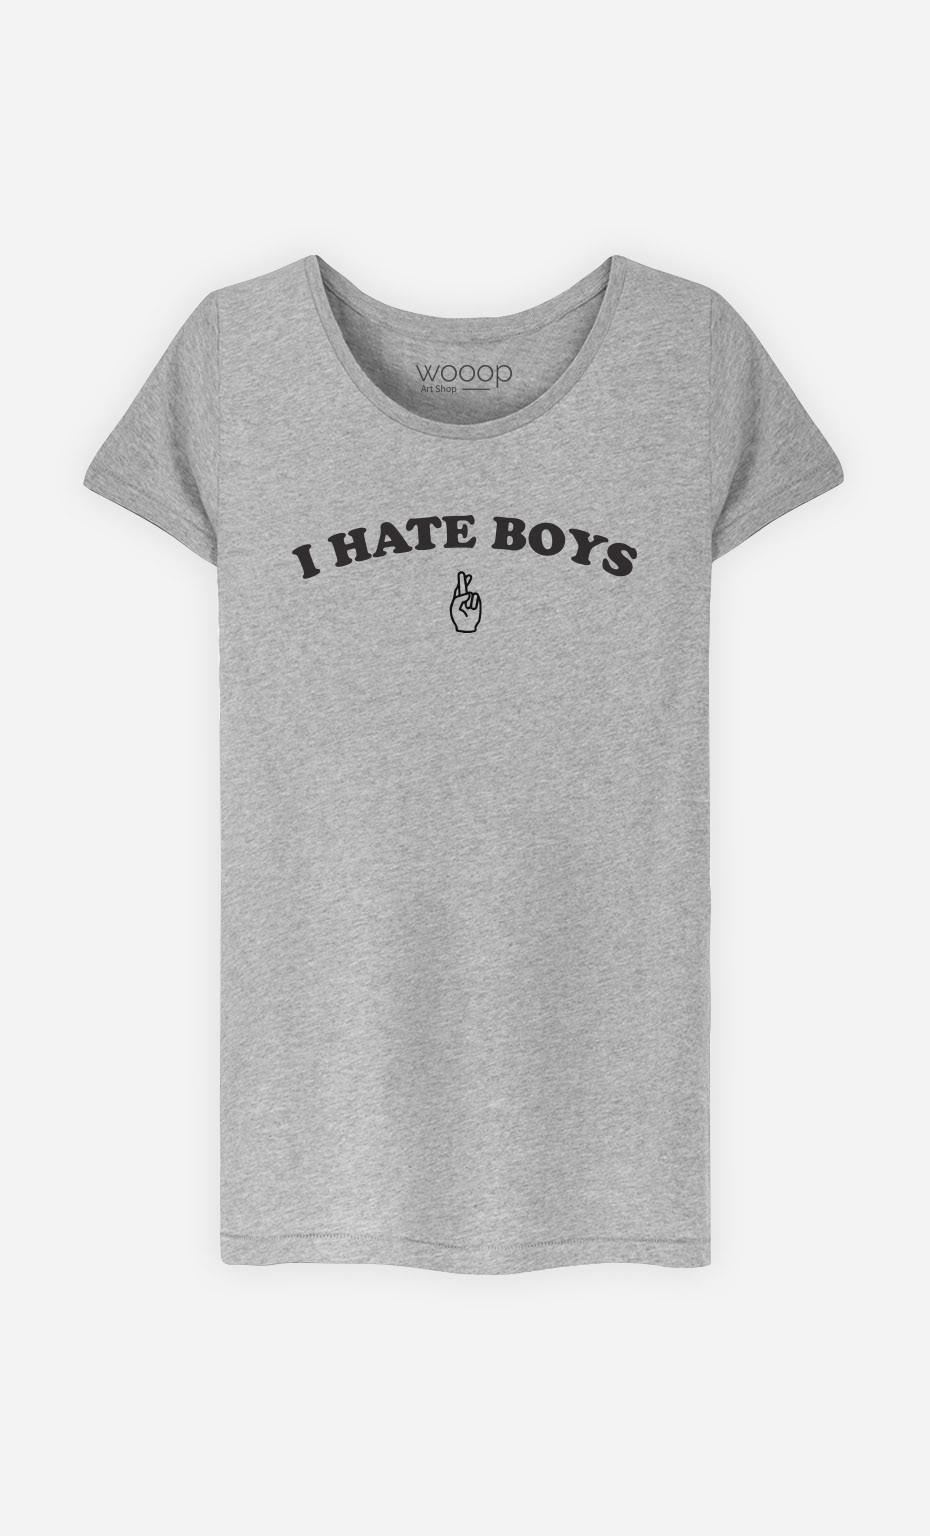 T-Shirt I hate boys